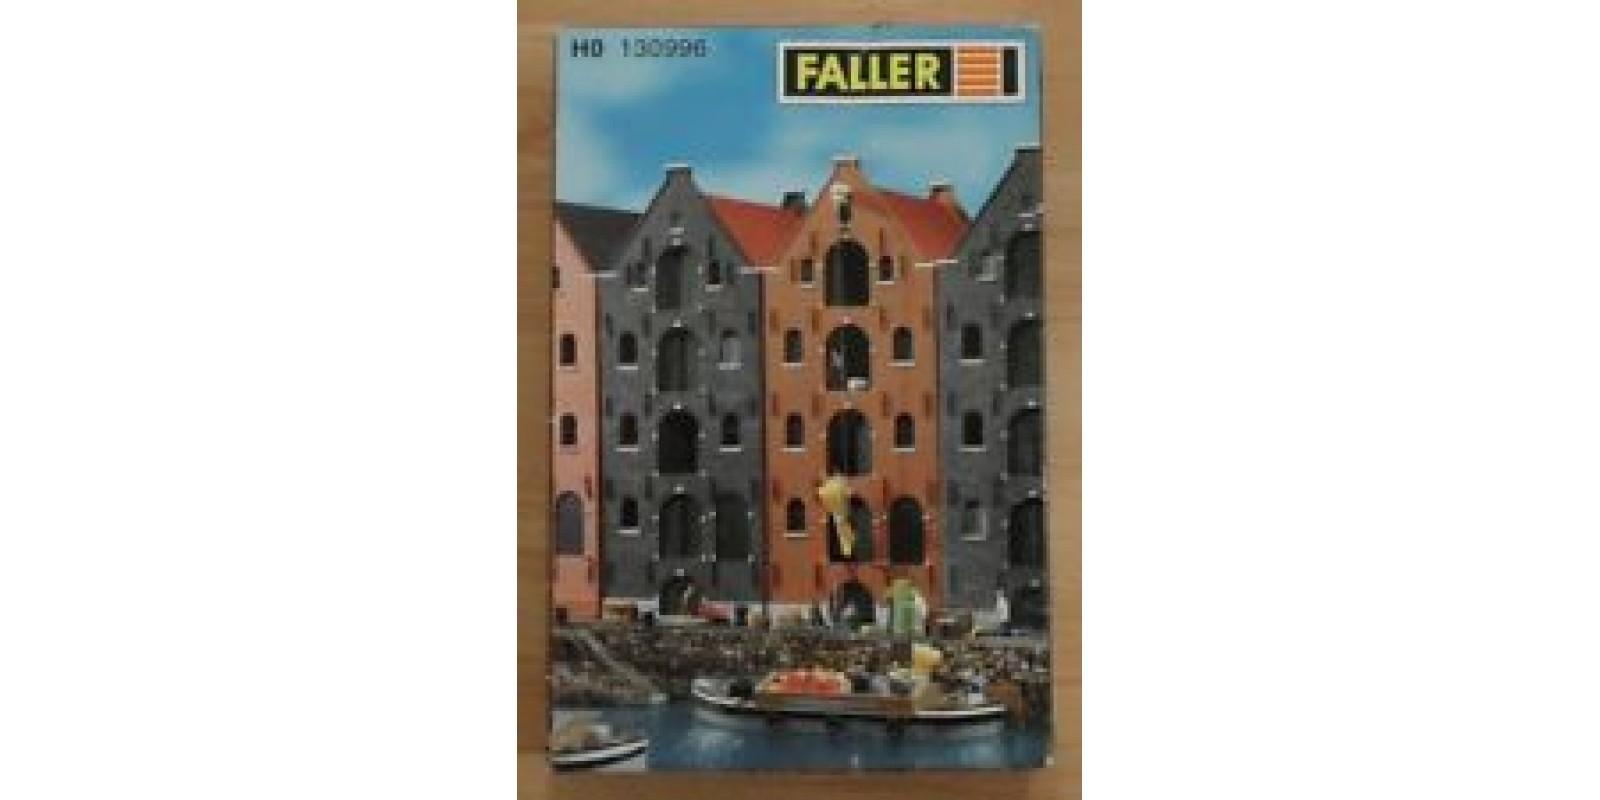 FA130998 North German Storehouse